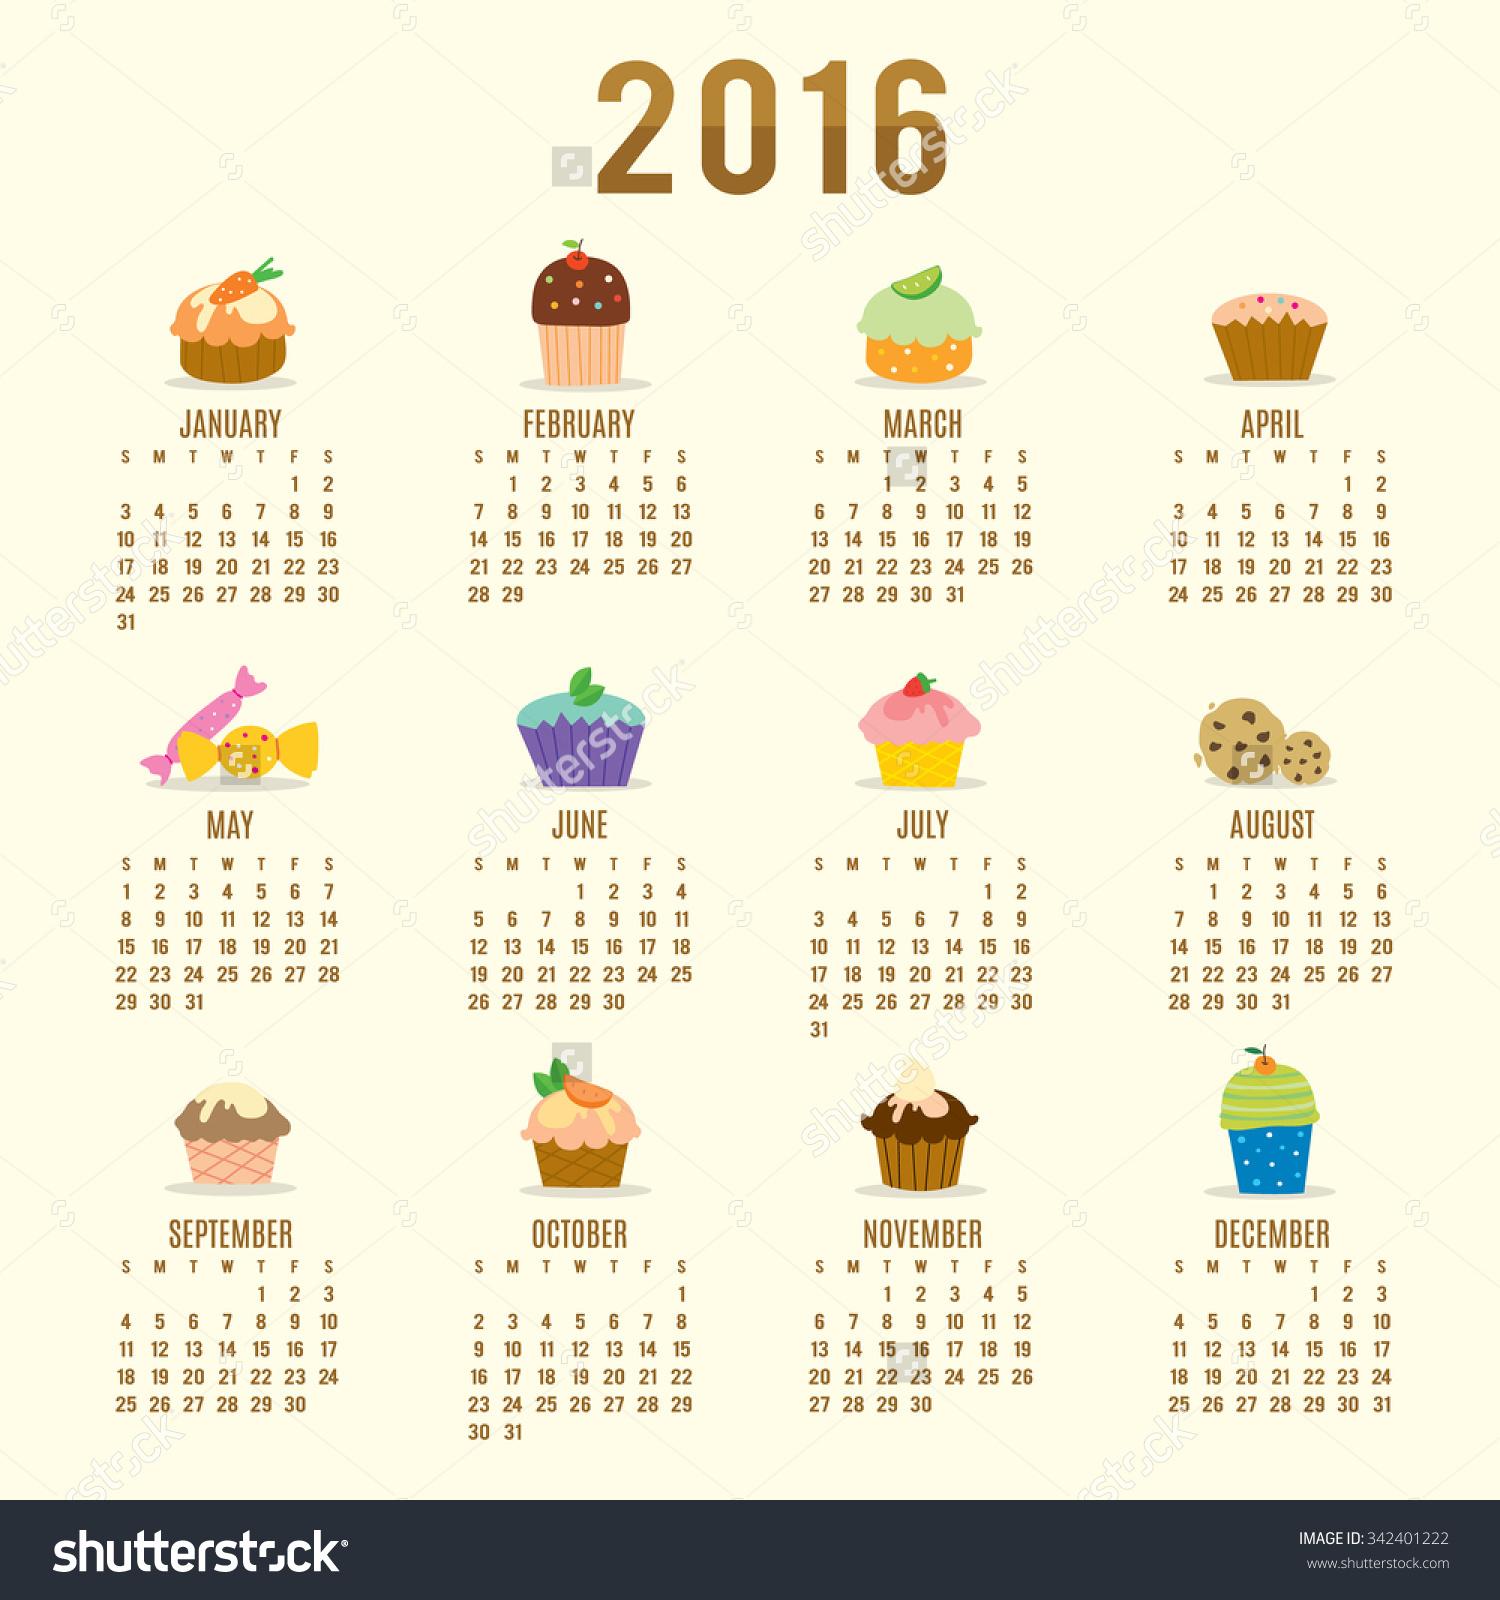 Clipart calendar 2016 svg transparent download Calendar 2016 Cupcake Cartoon Cute Vector Stock Vector 342401222 ... svg transparent download